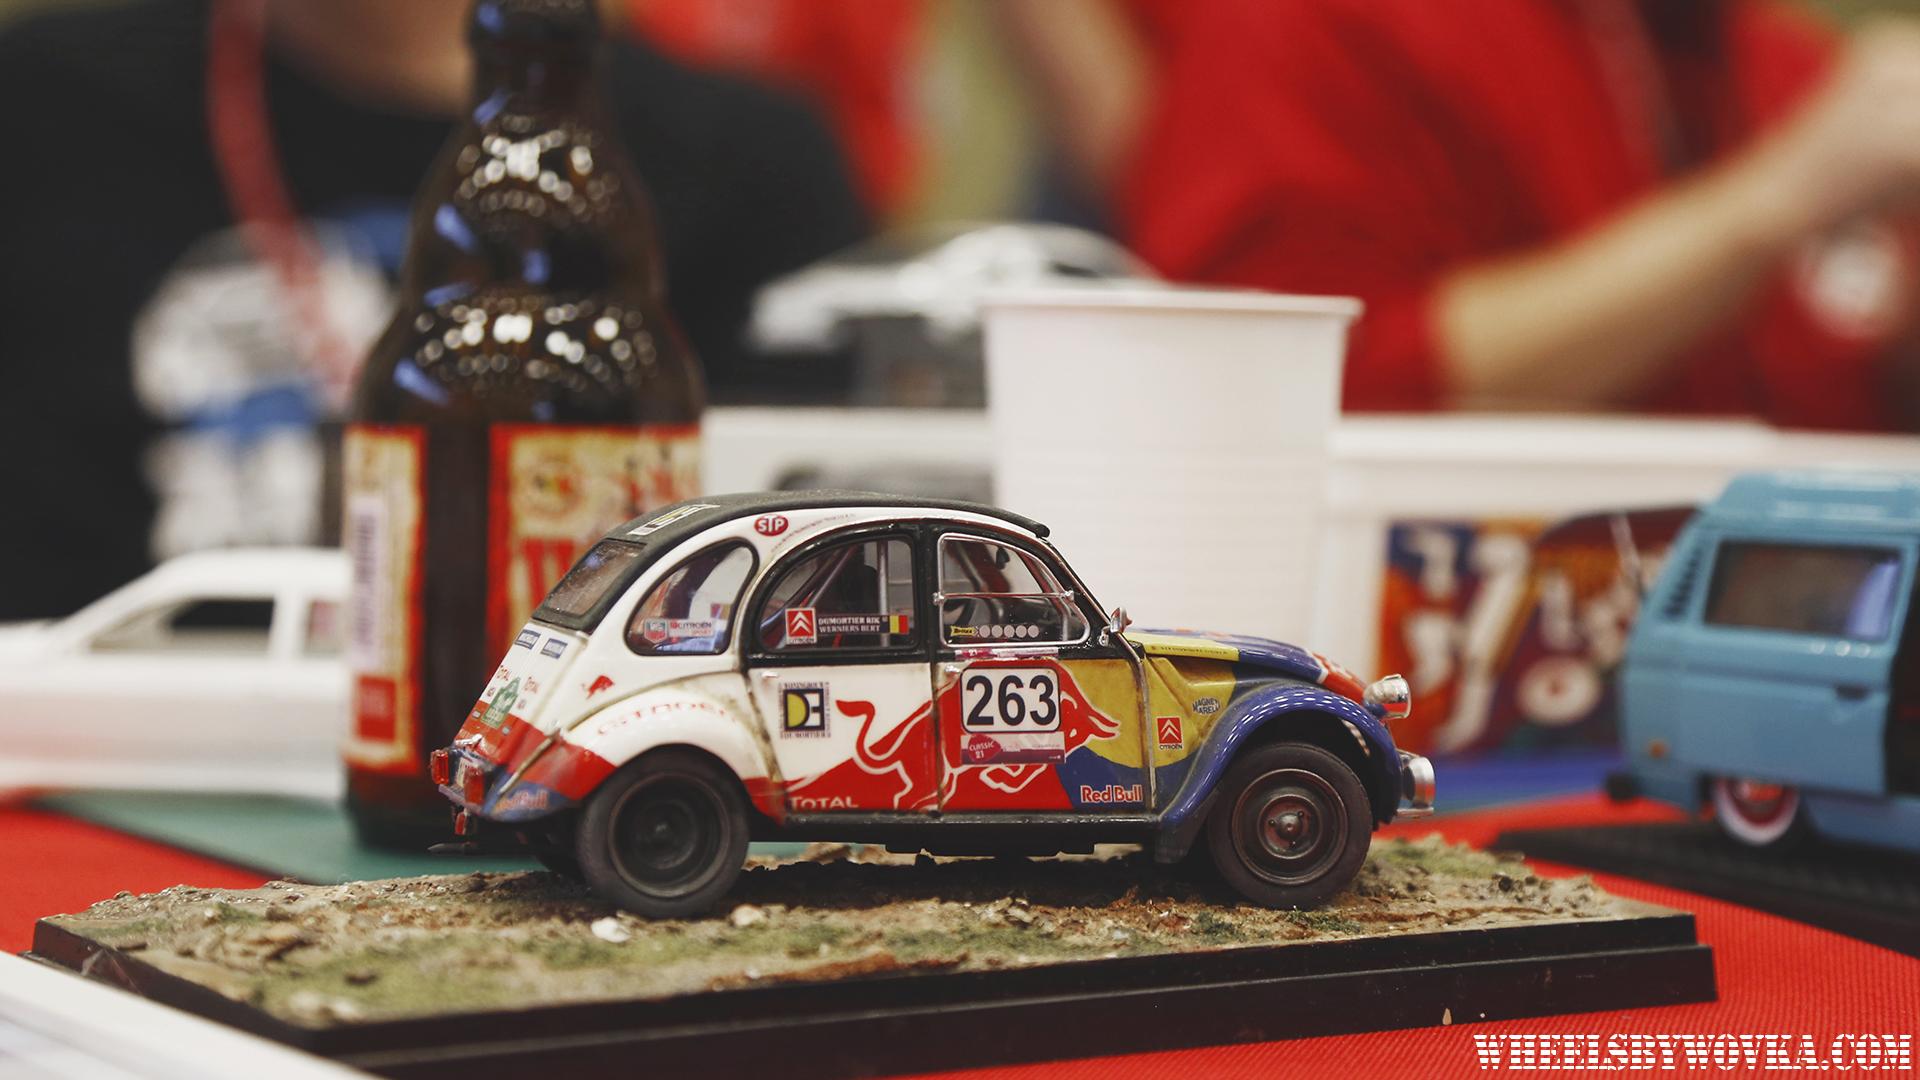 model-car-show-frankfurt-2017-117